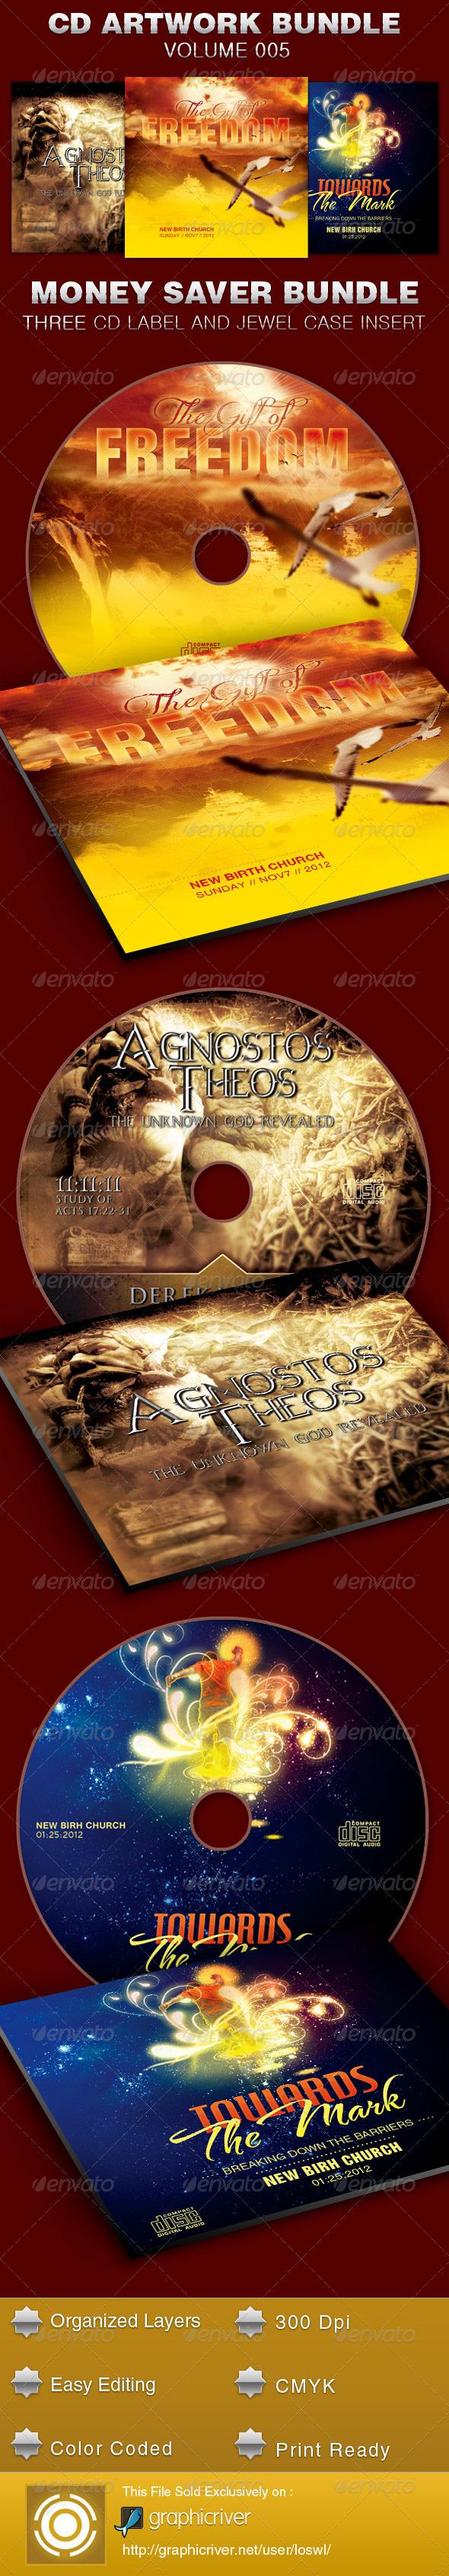 GraphicRiver CD Cover Artwork Bundle-Vol 005 5389502